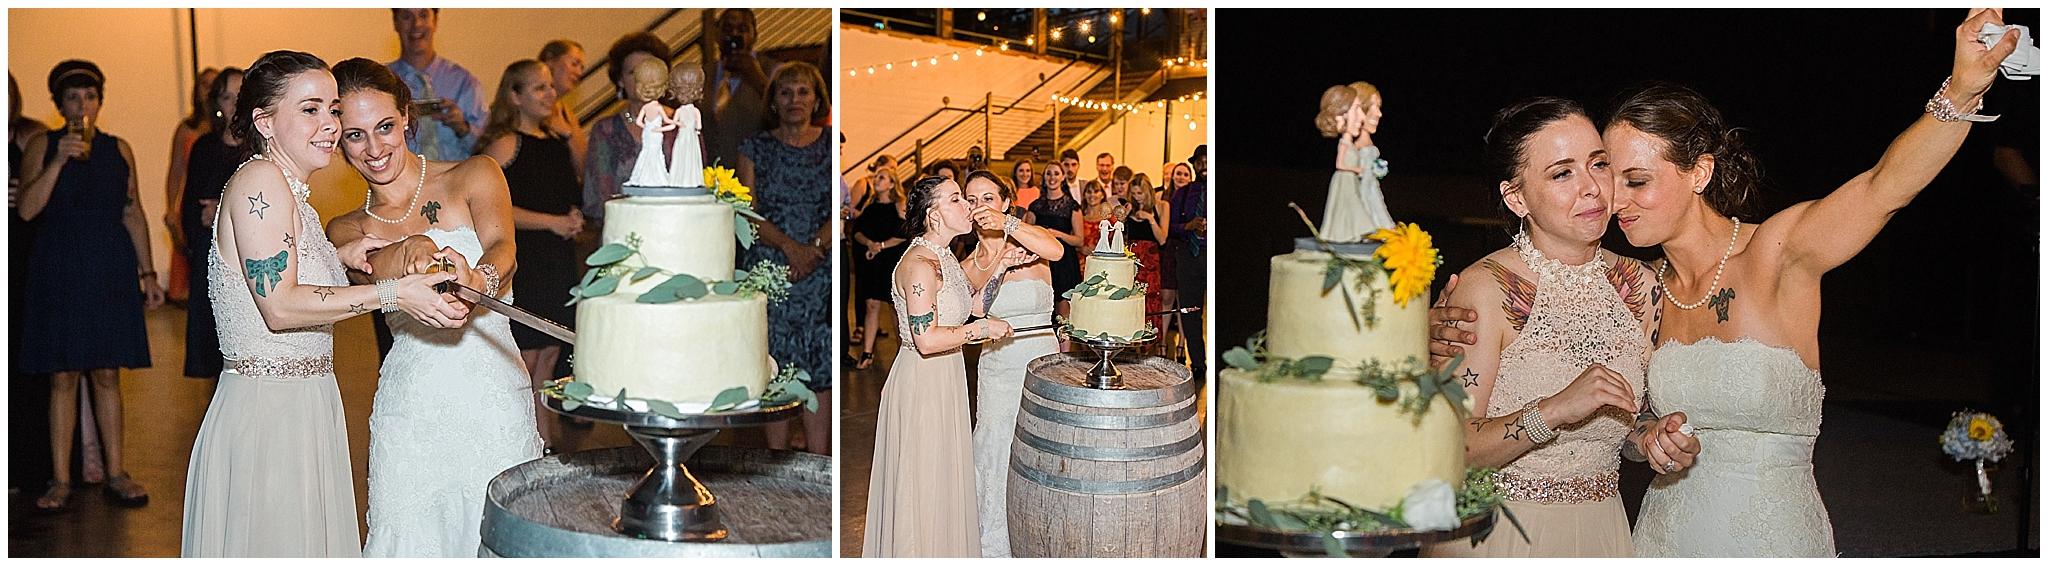 Wedding_Asheville_Highland_Brewing_Photographer_33.jpg